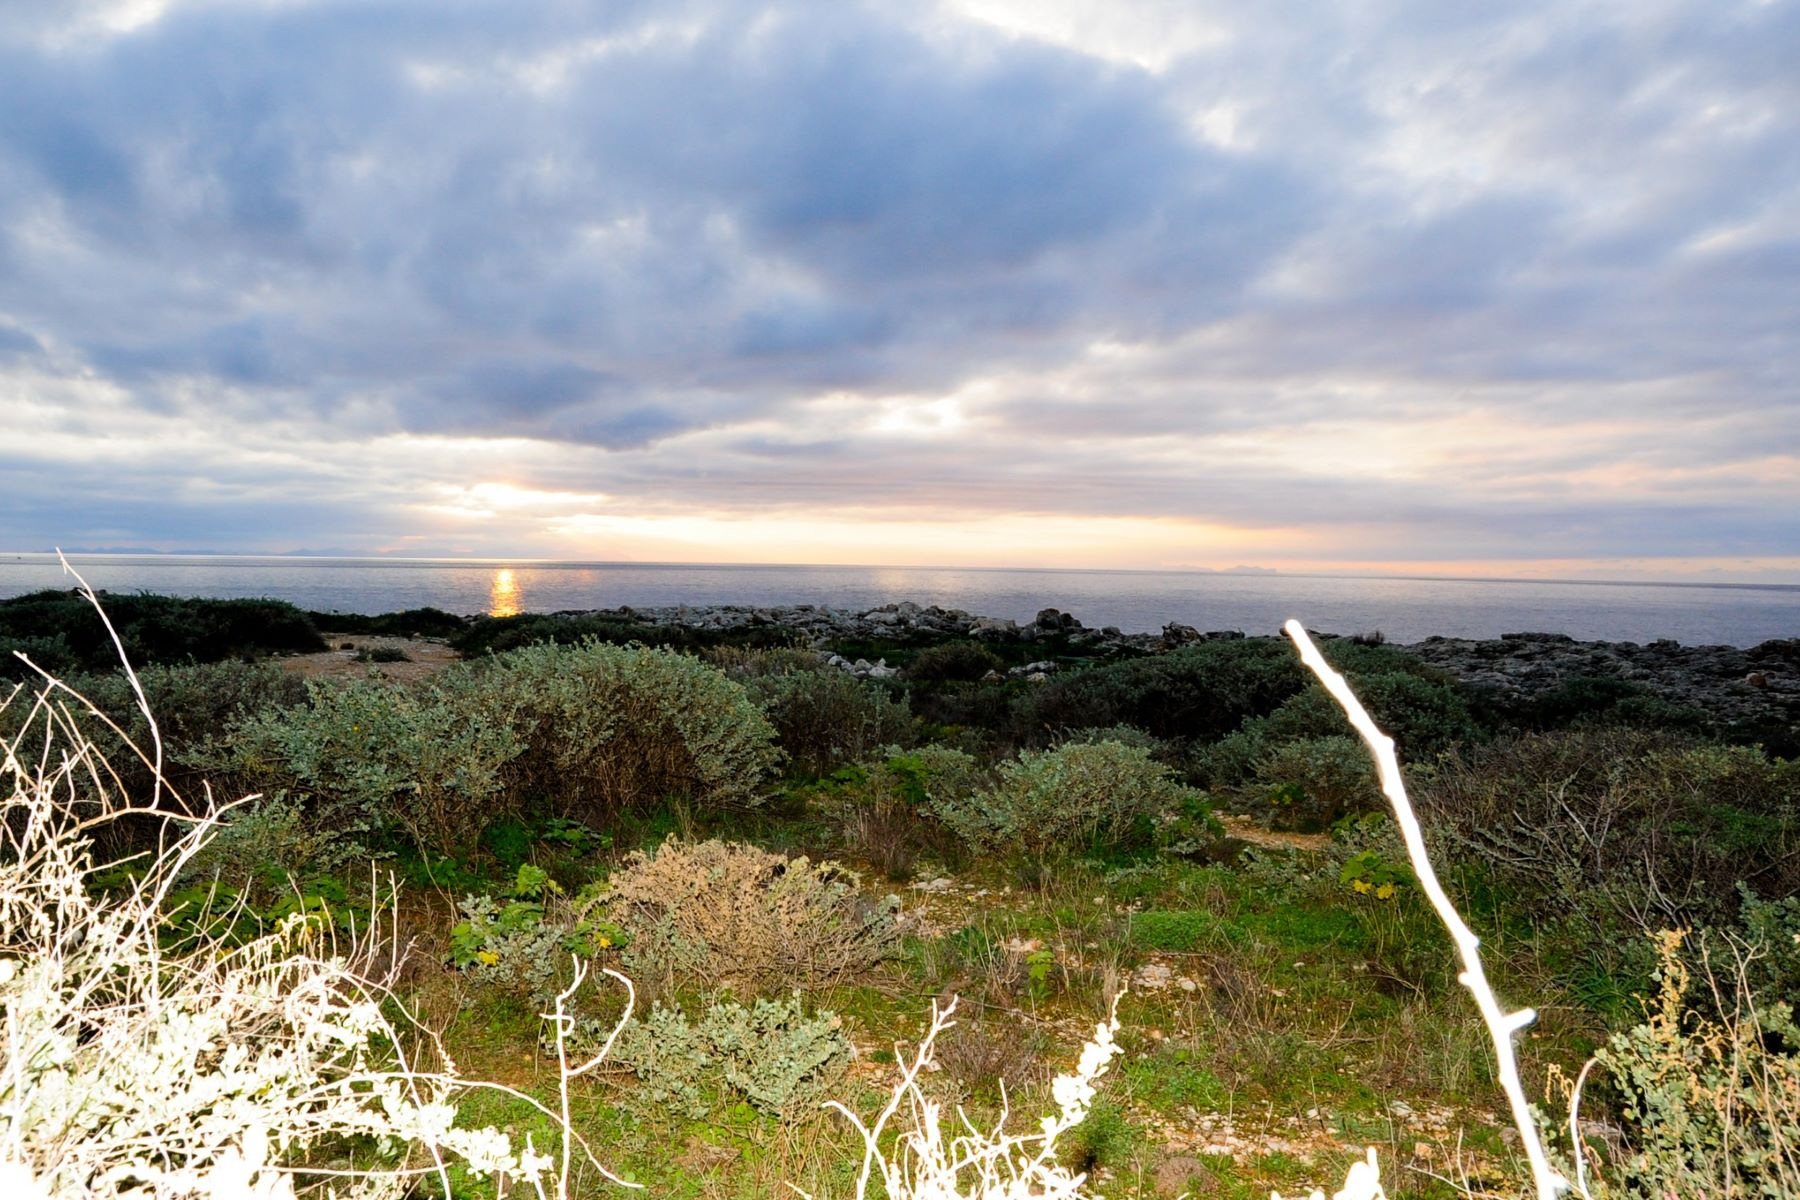 Land for Sale at Sea front plot in Cala Blanca Menorca, Menorca, Spain